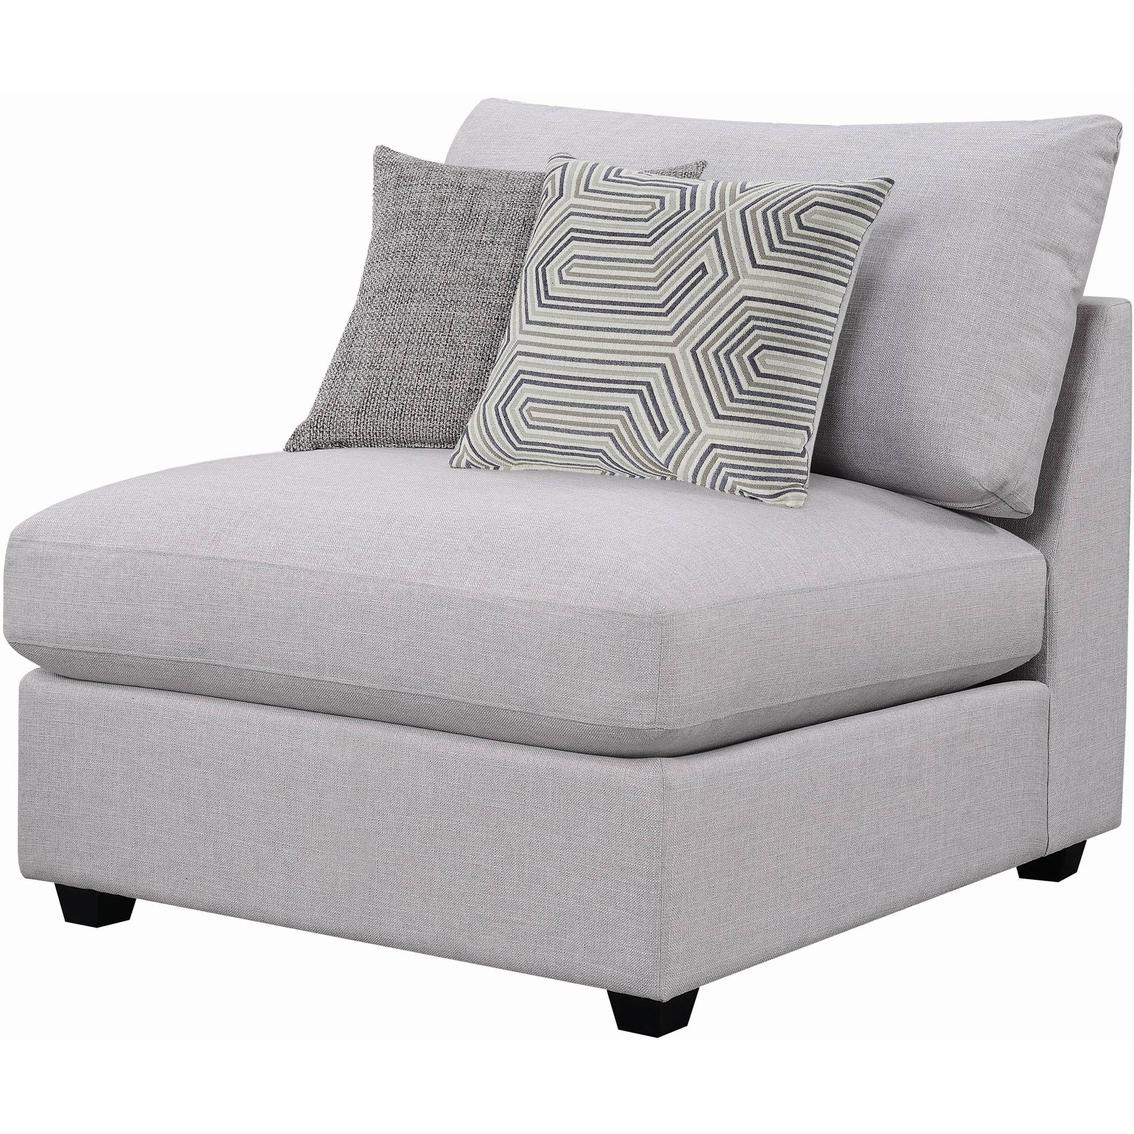 Pleasing Scott Living Charlotte Modern Sectional Armless Chair Spiritservingveterans Wood Chair Design Ideas Spiritservingveteransorg